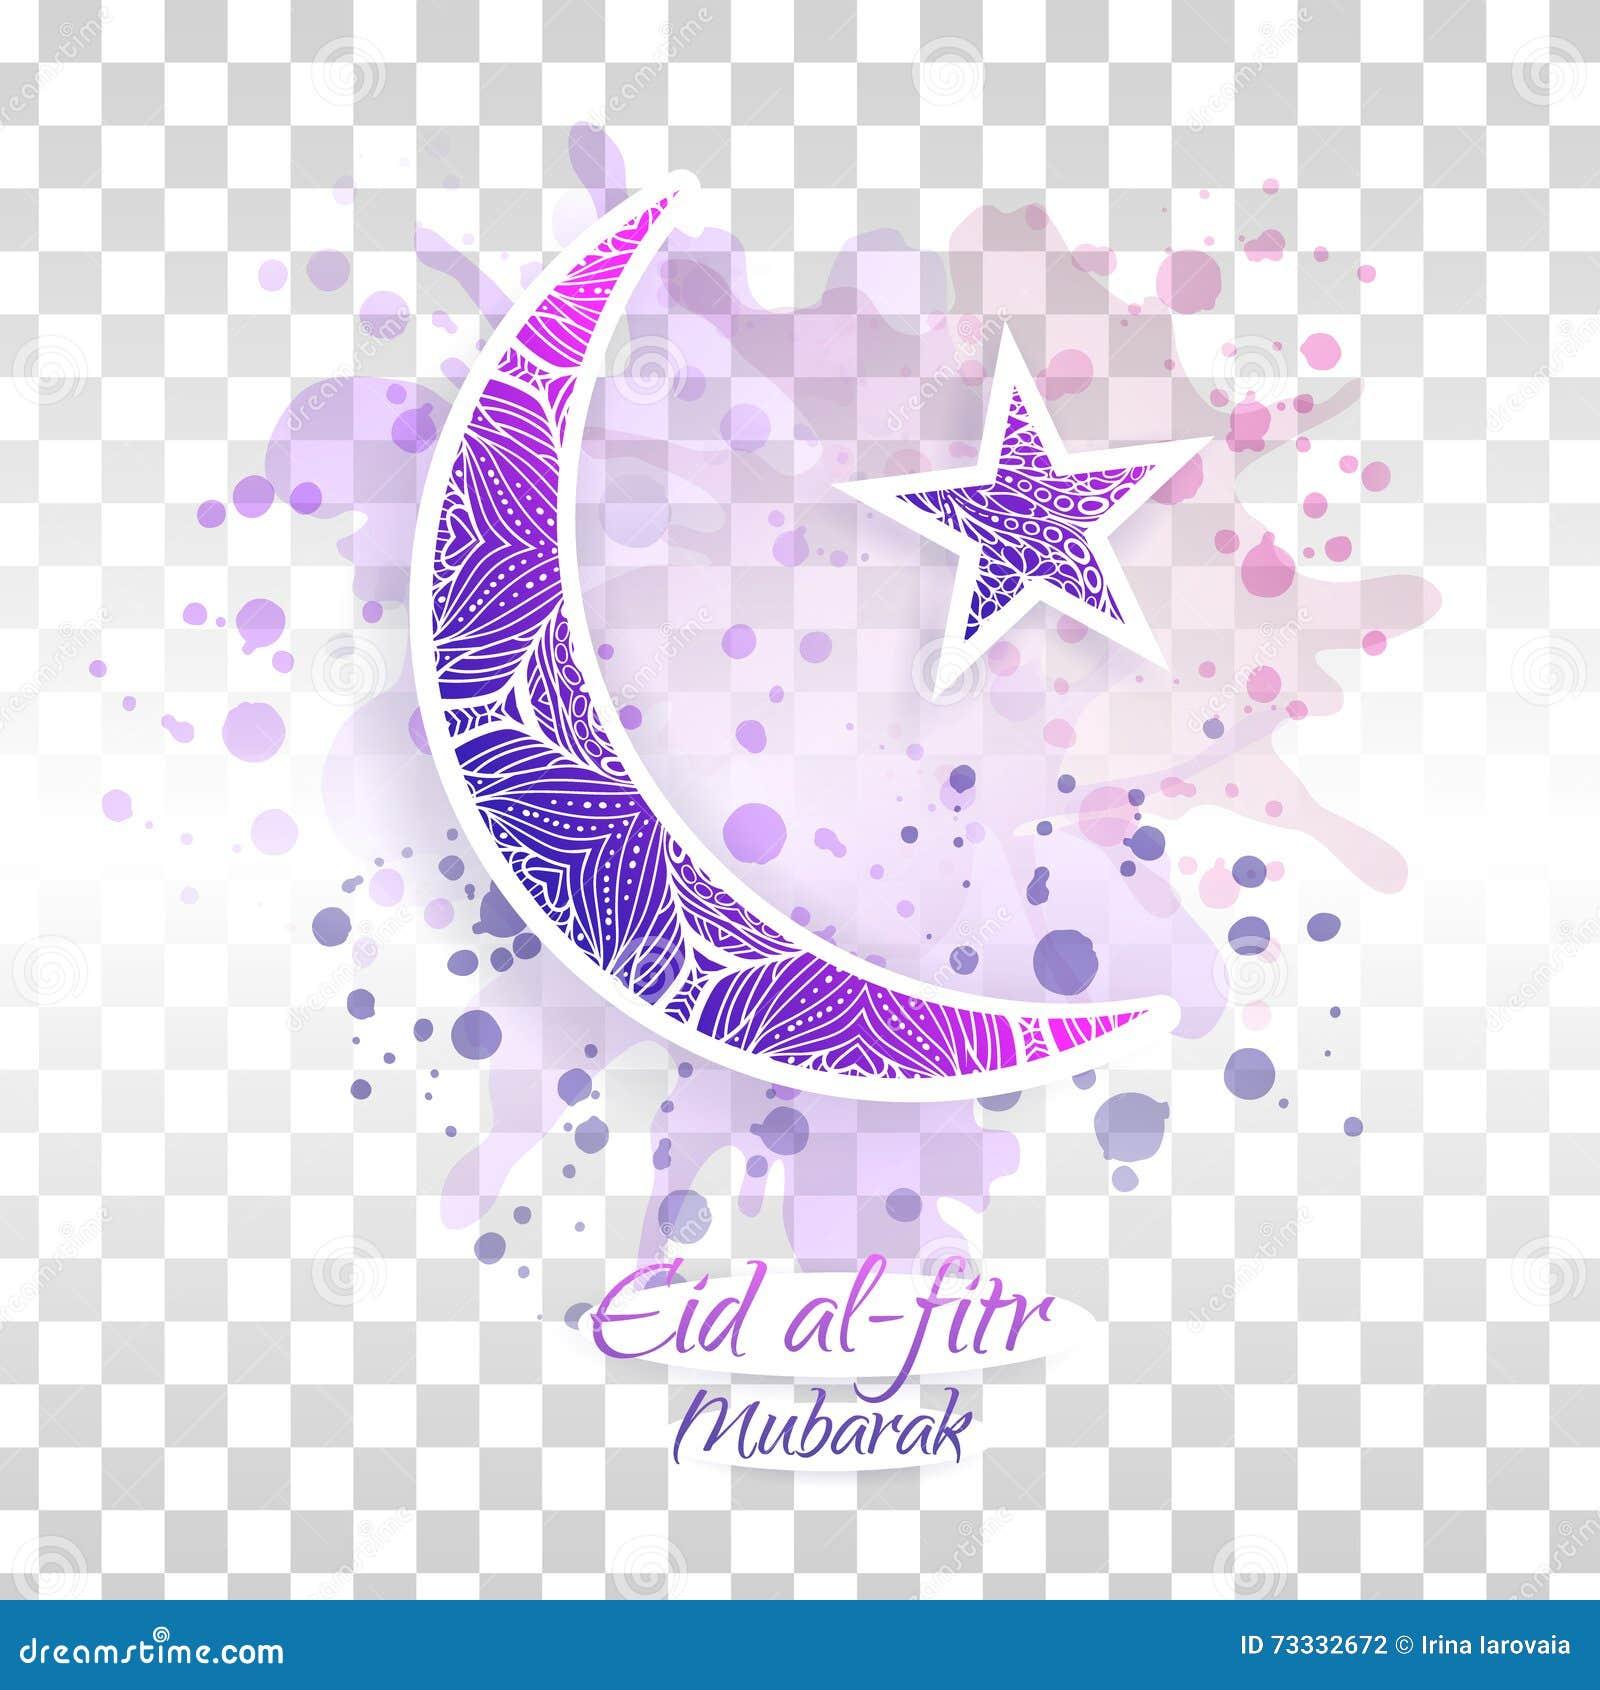 Cool Eid Special Eid Al-Fitr Feast - eid-al-fitr-vector-illustration-transparent-background-crescent-star-blue-purple-design-festival-73332672  Collection_934735 .jpg